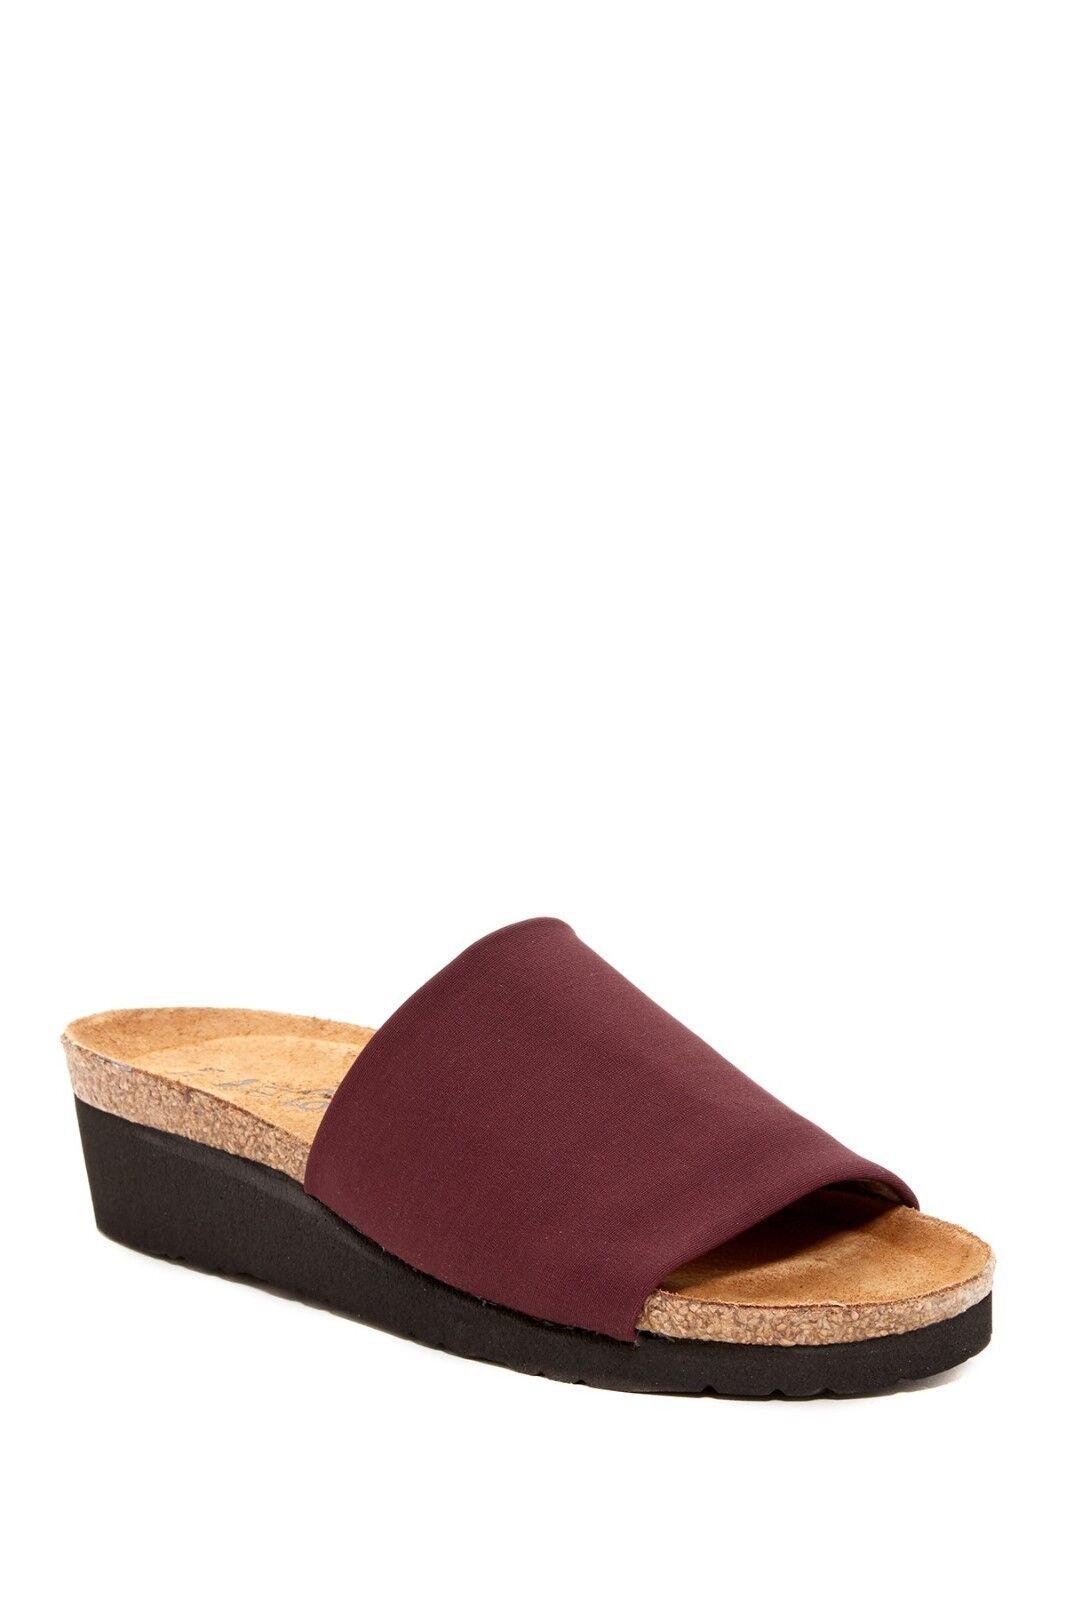 Naot ALANA Slide Sandal NIB SlipOn Mule ORTHOTIC Wedge PLUM STRETCH 37  41 42